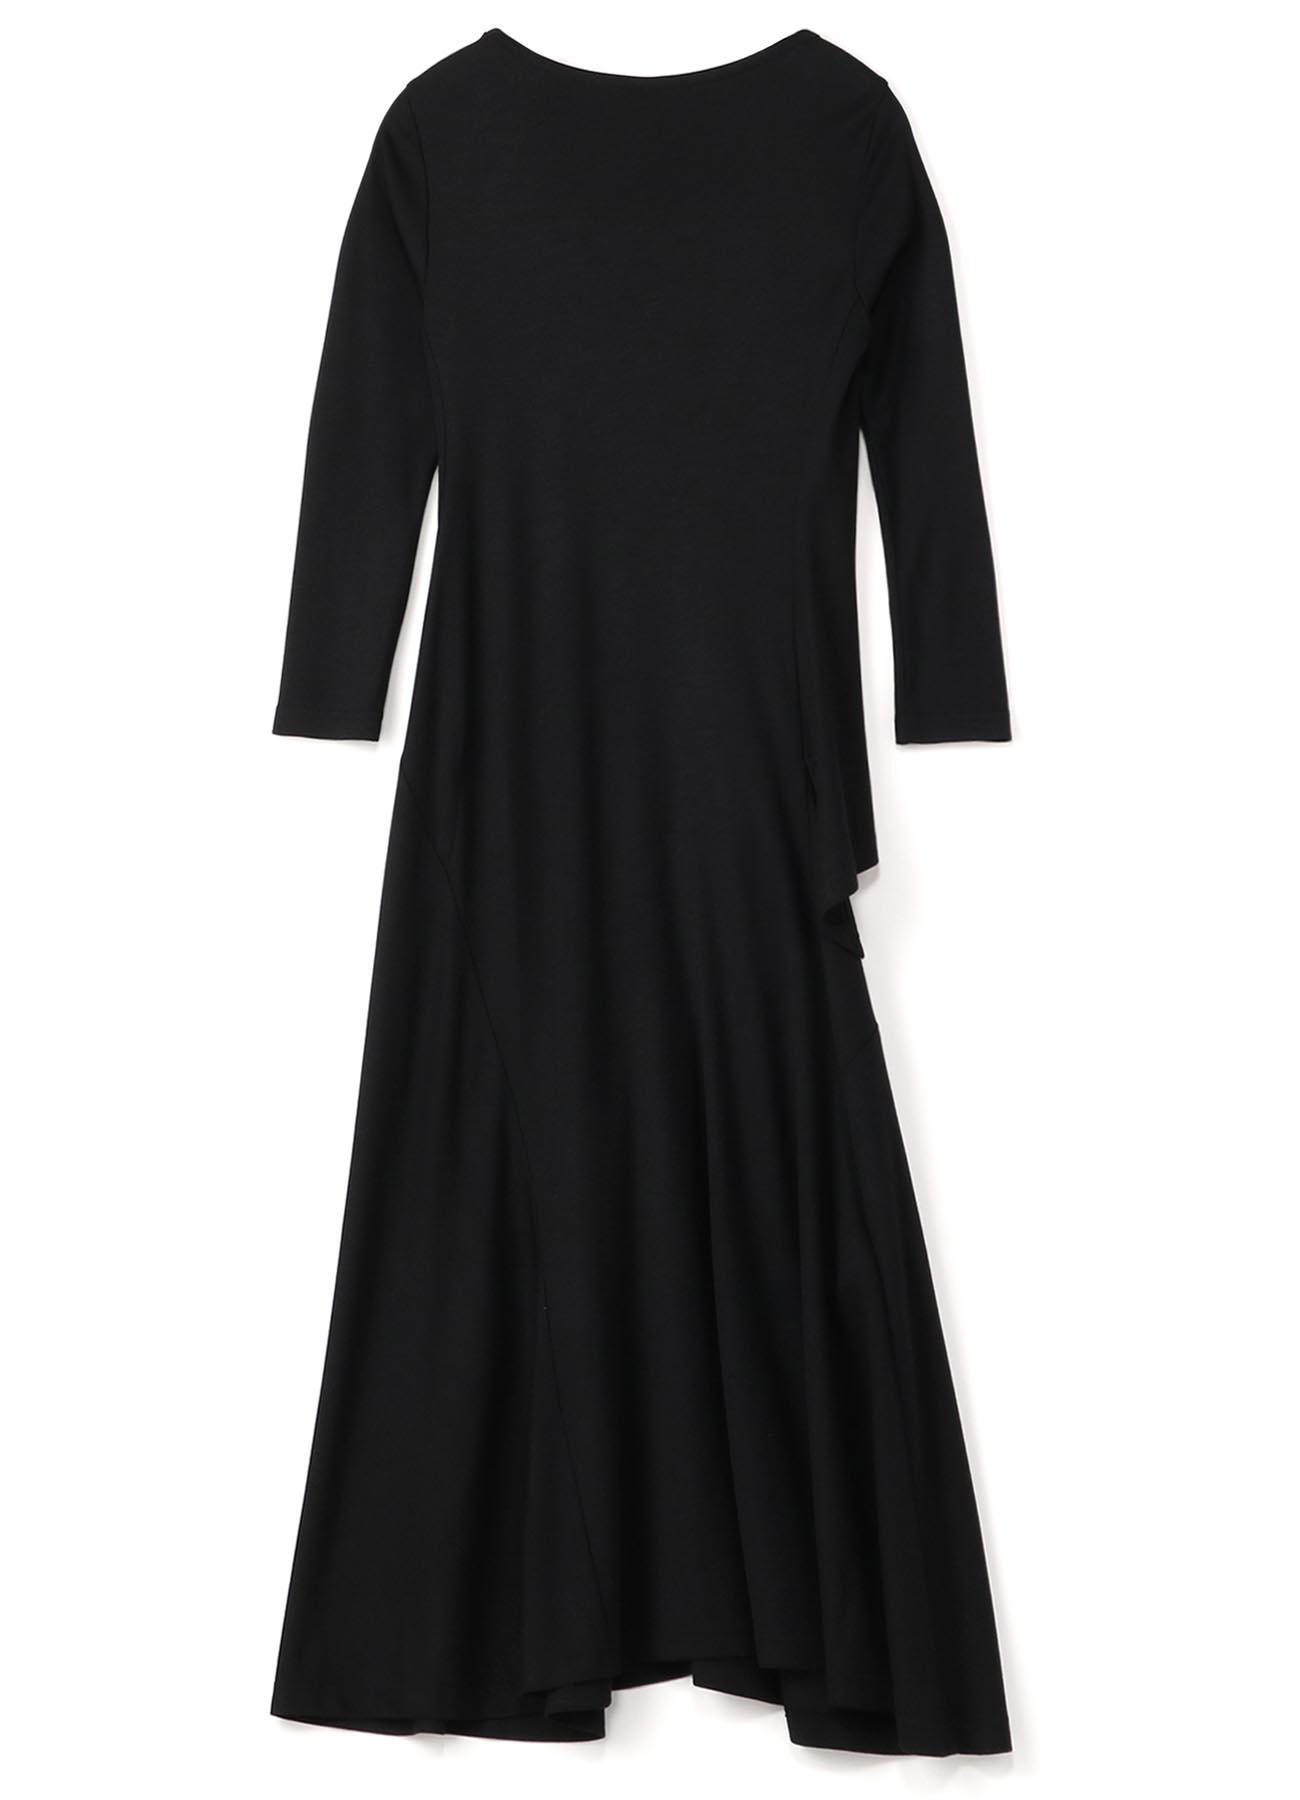 Ry/W OLIVIA SMOOTH CS ASYMME DRESS